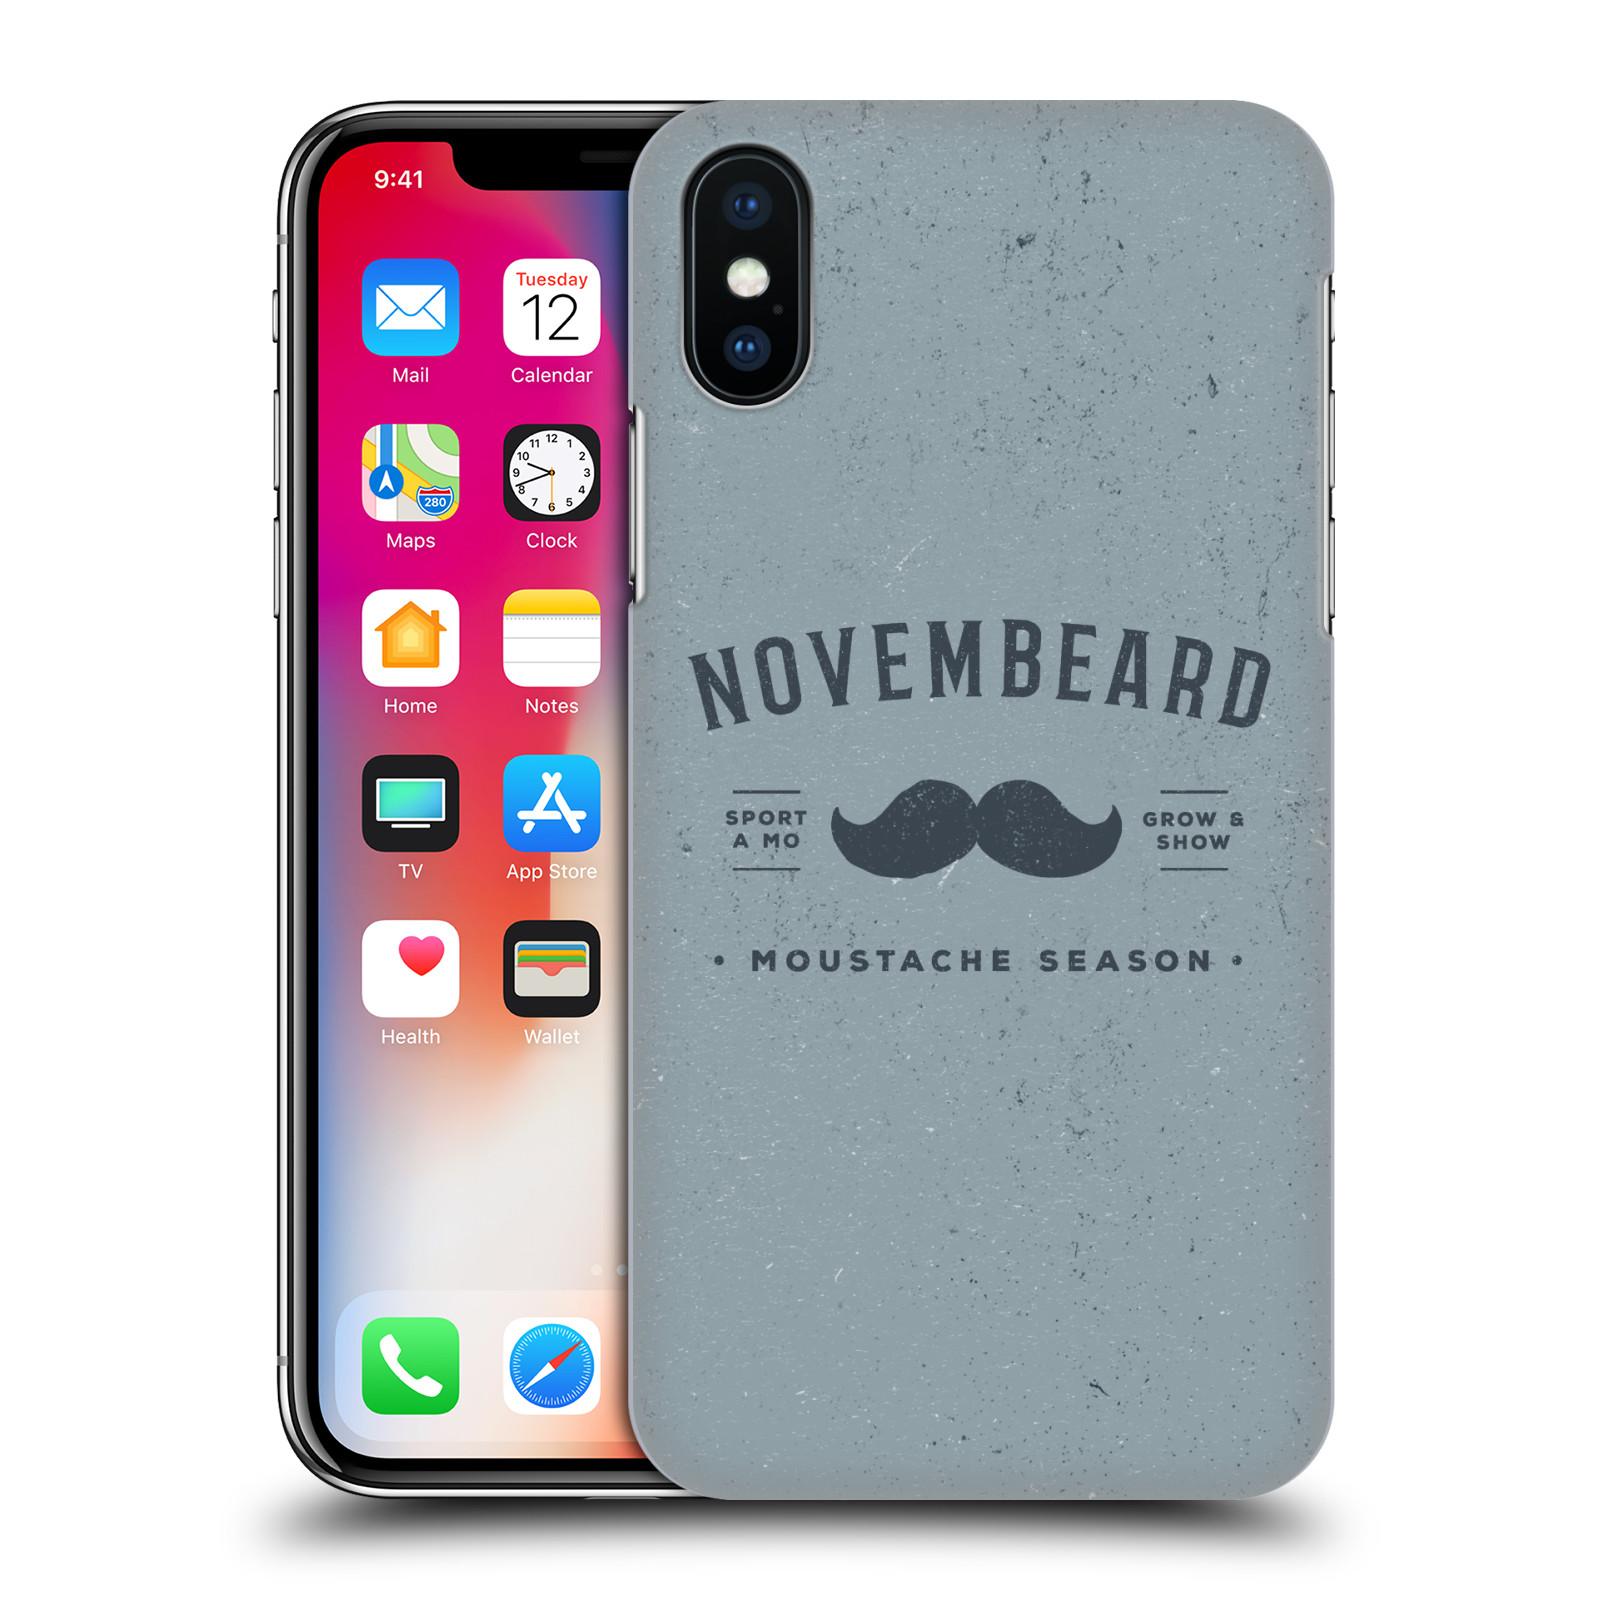 HEAD-CASE-DESIGNS-NOVEMBER-HARD-BACK-CASE-FOR-APPLE-iPHONE-PHONES